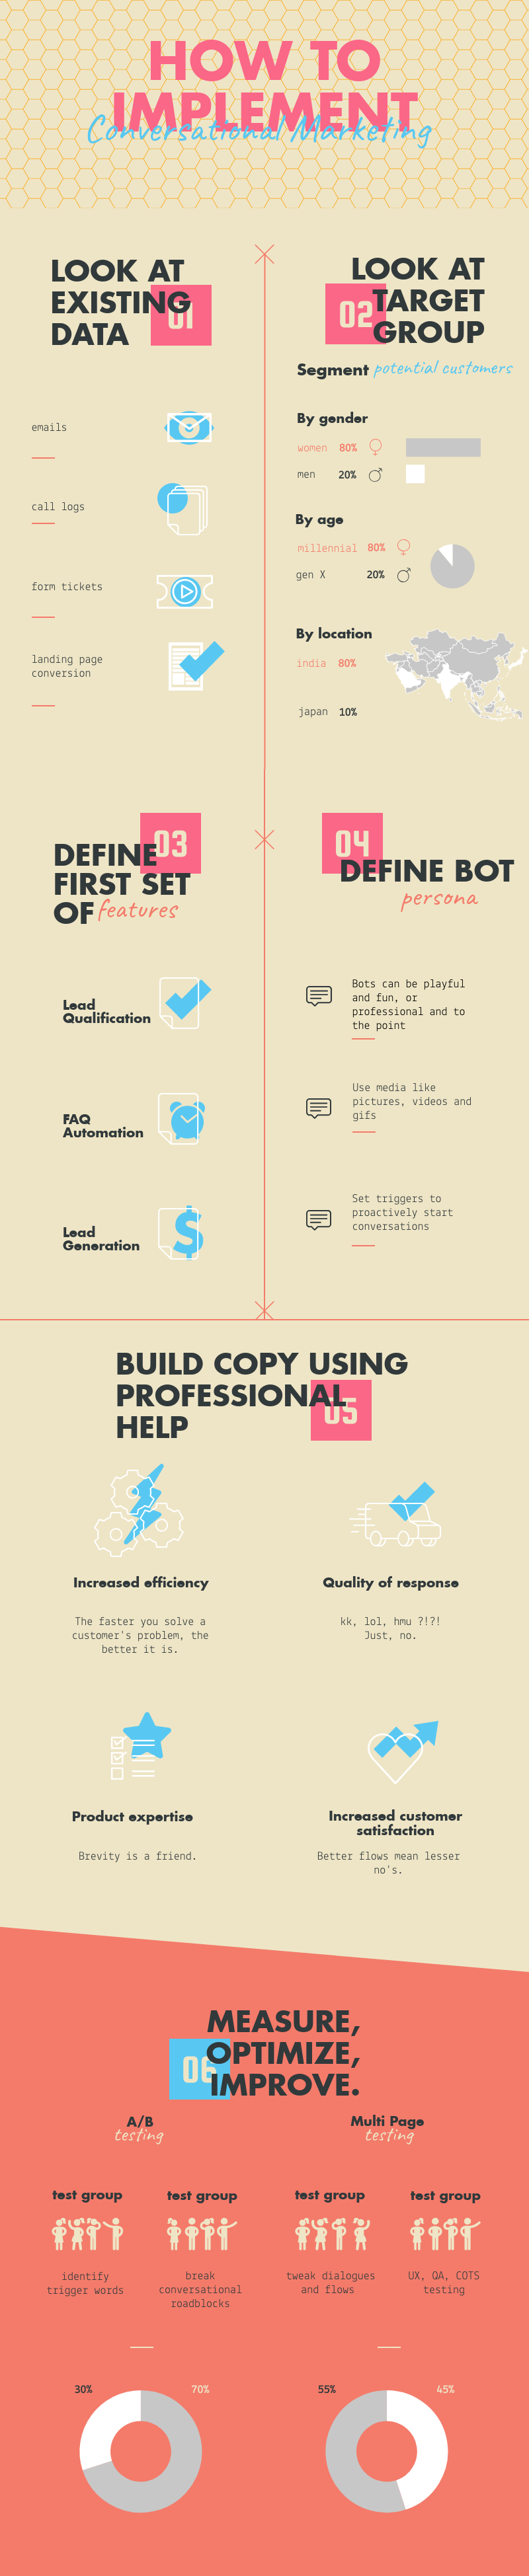 conversational marketing infographic